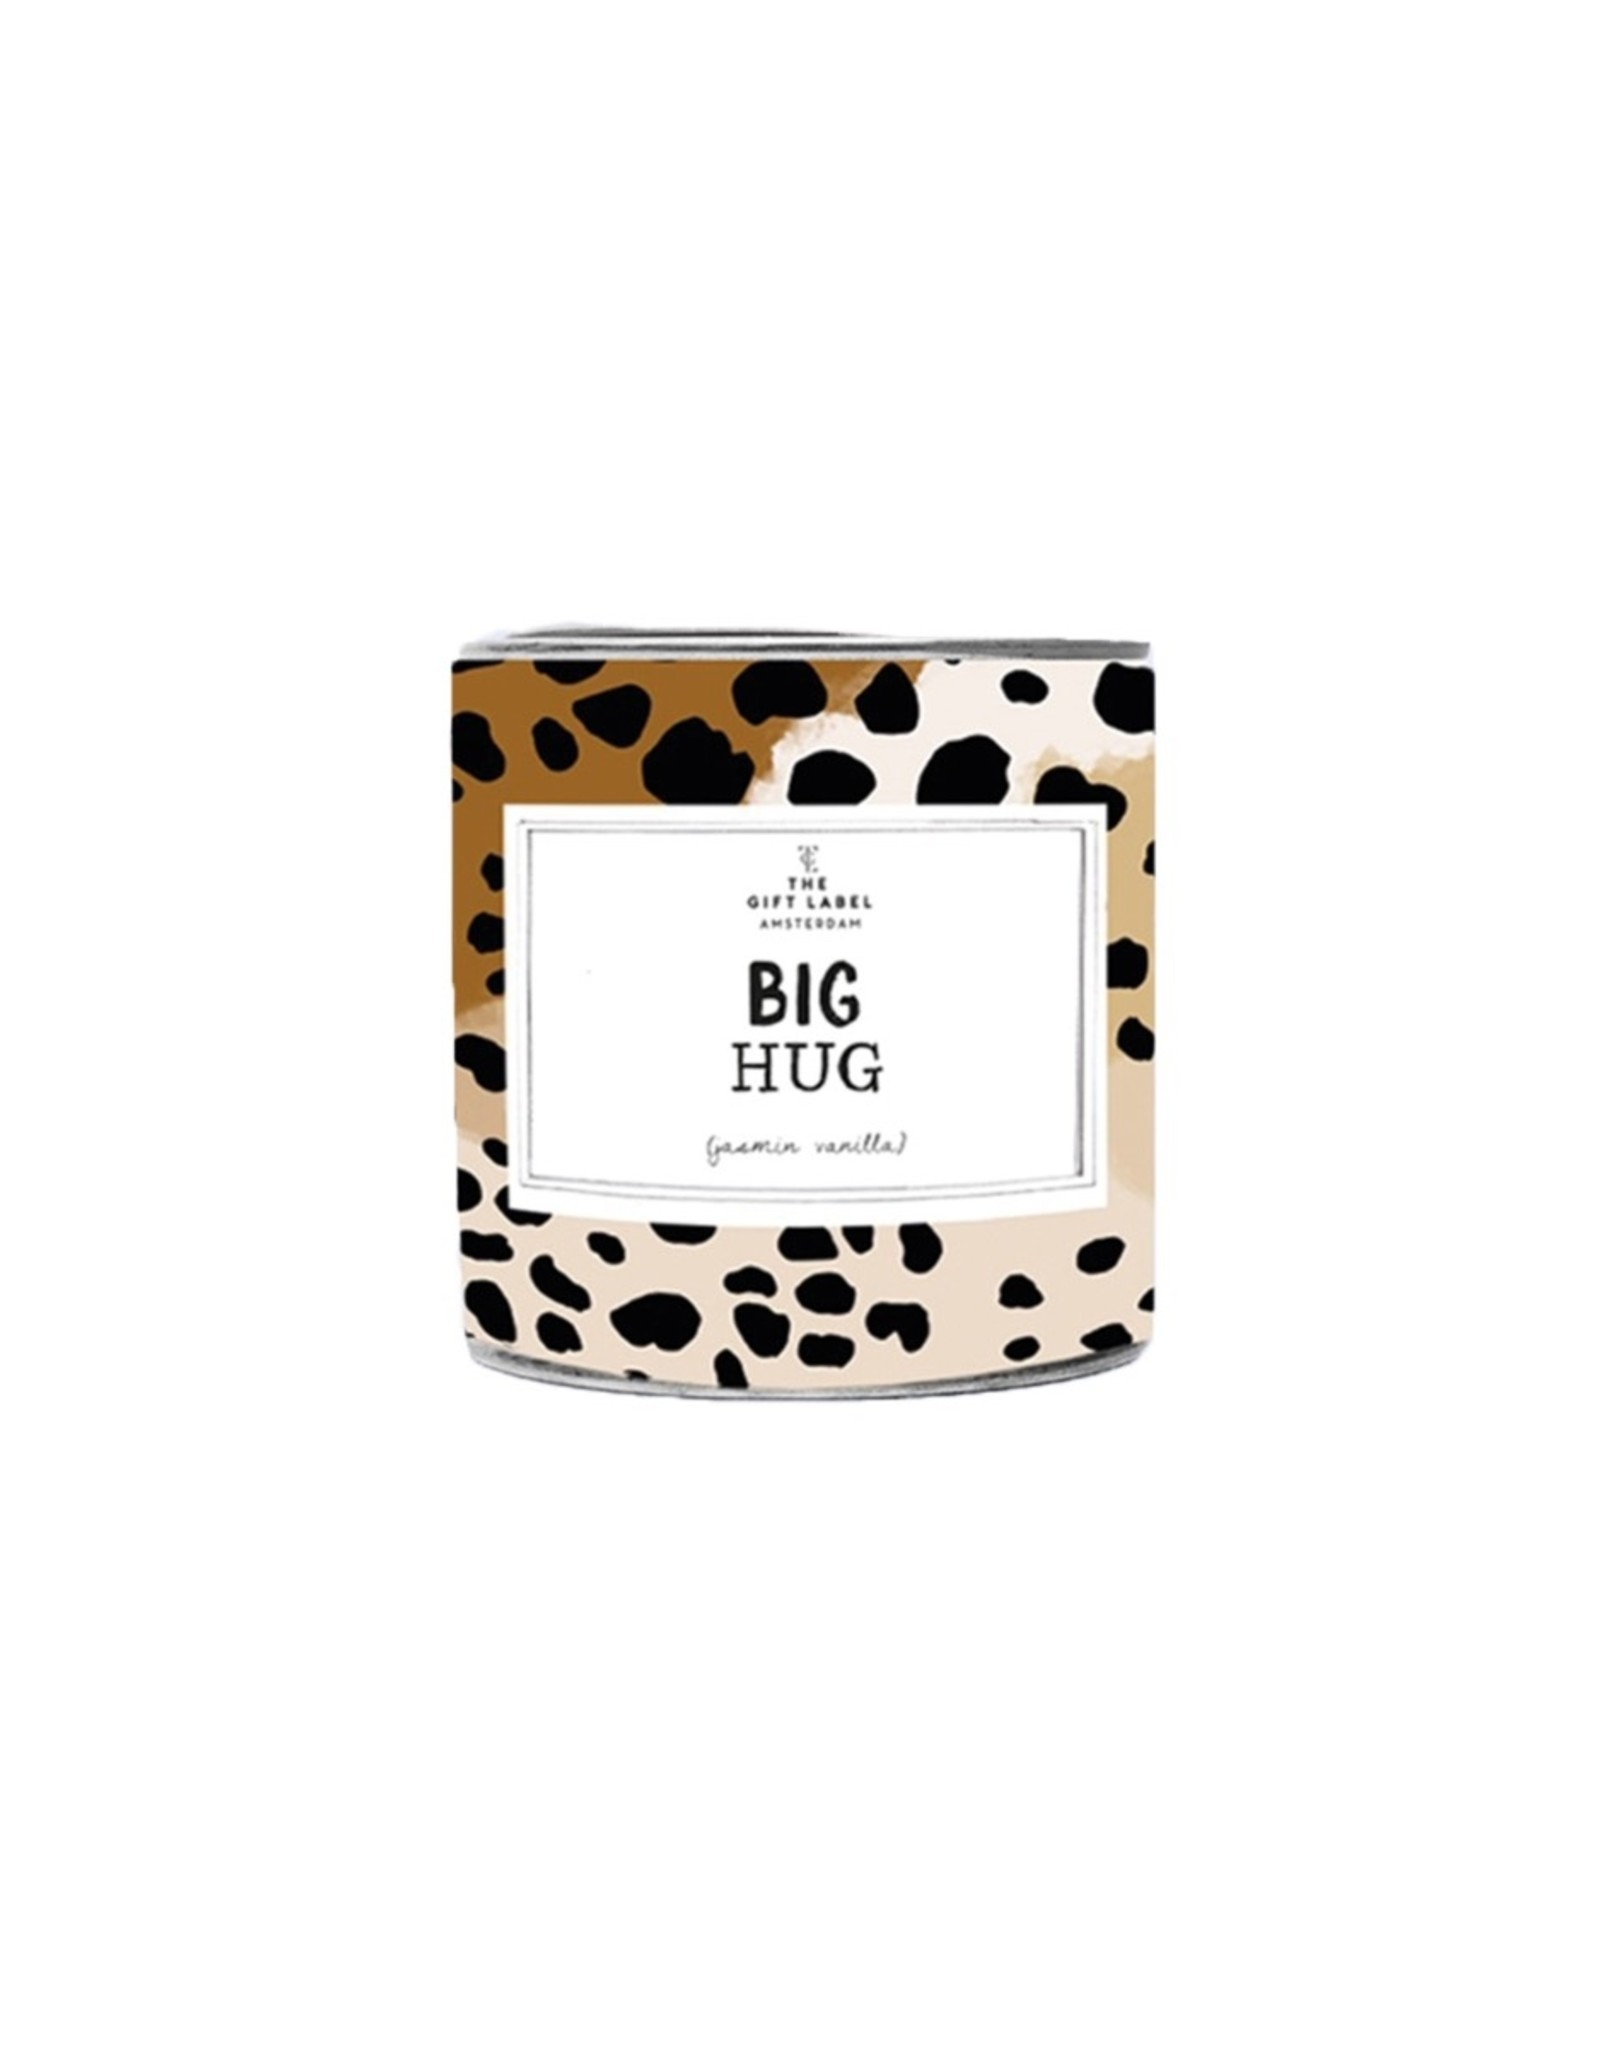 The Gift Label The Gift Label Candle Tin Big Hug Jasmine / Vanilla S